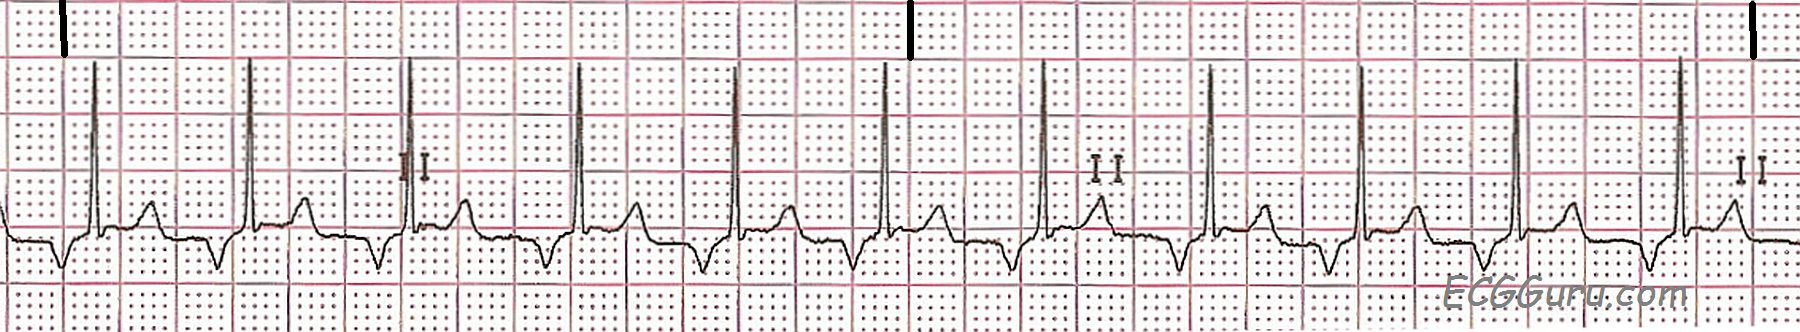 ECG Basics: Retrograde P Waves | ECG Guru - Instructor ...